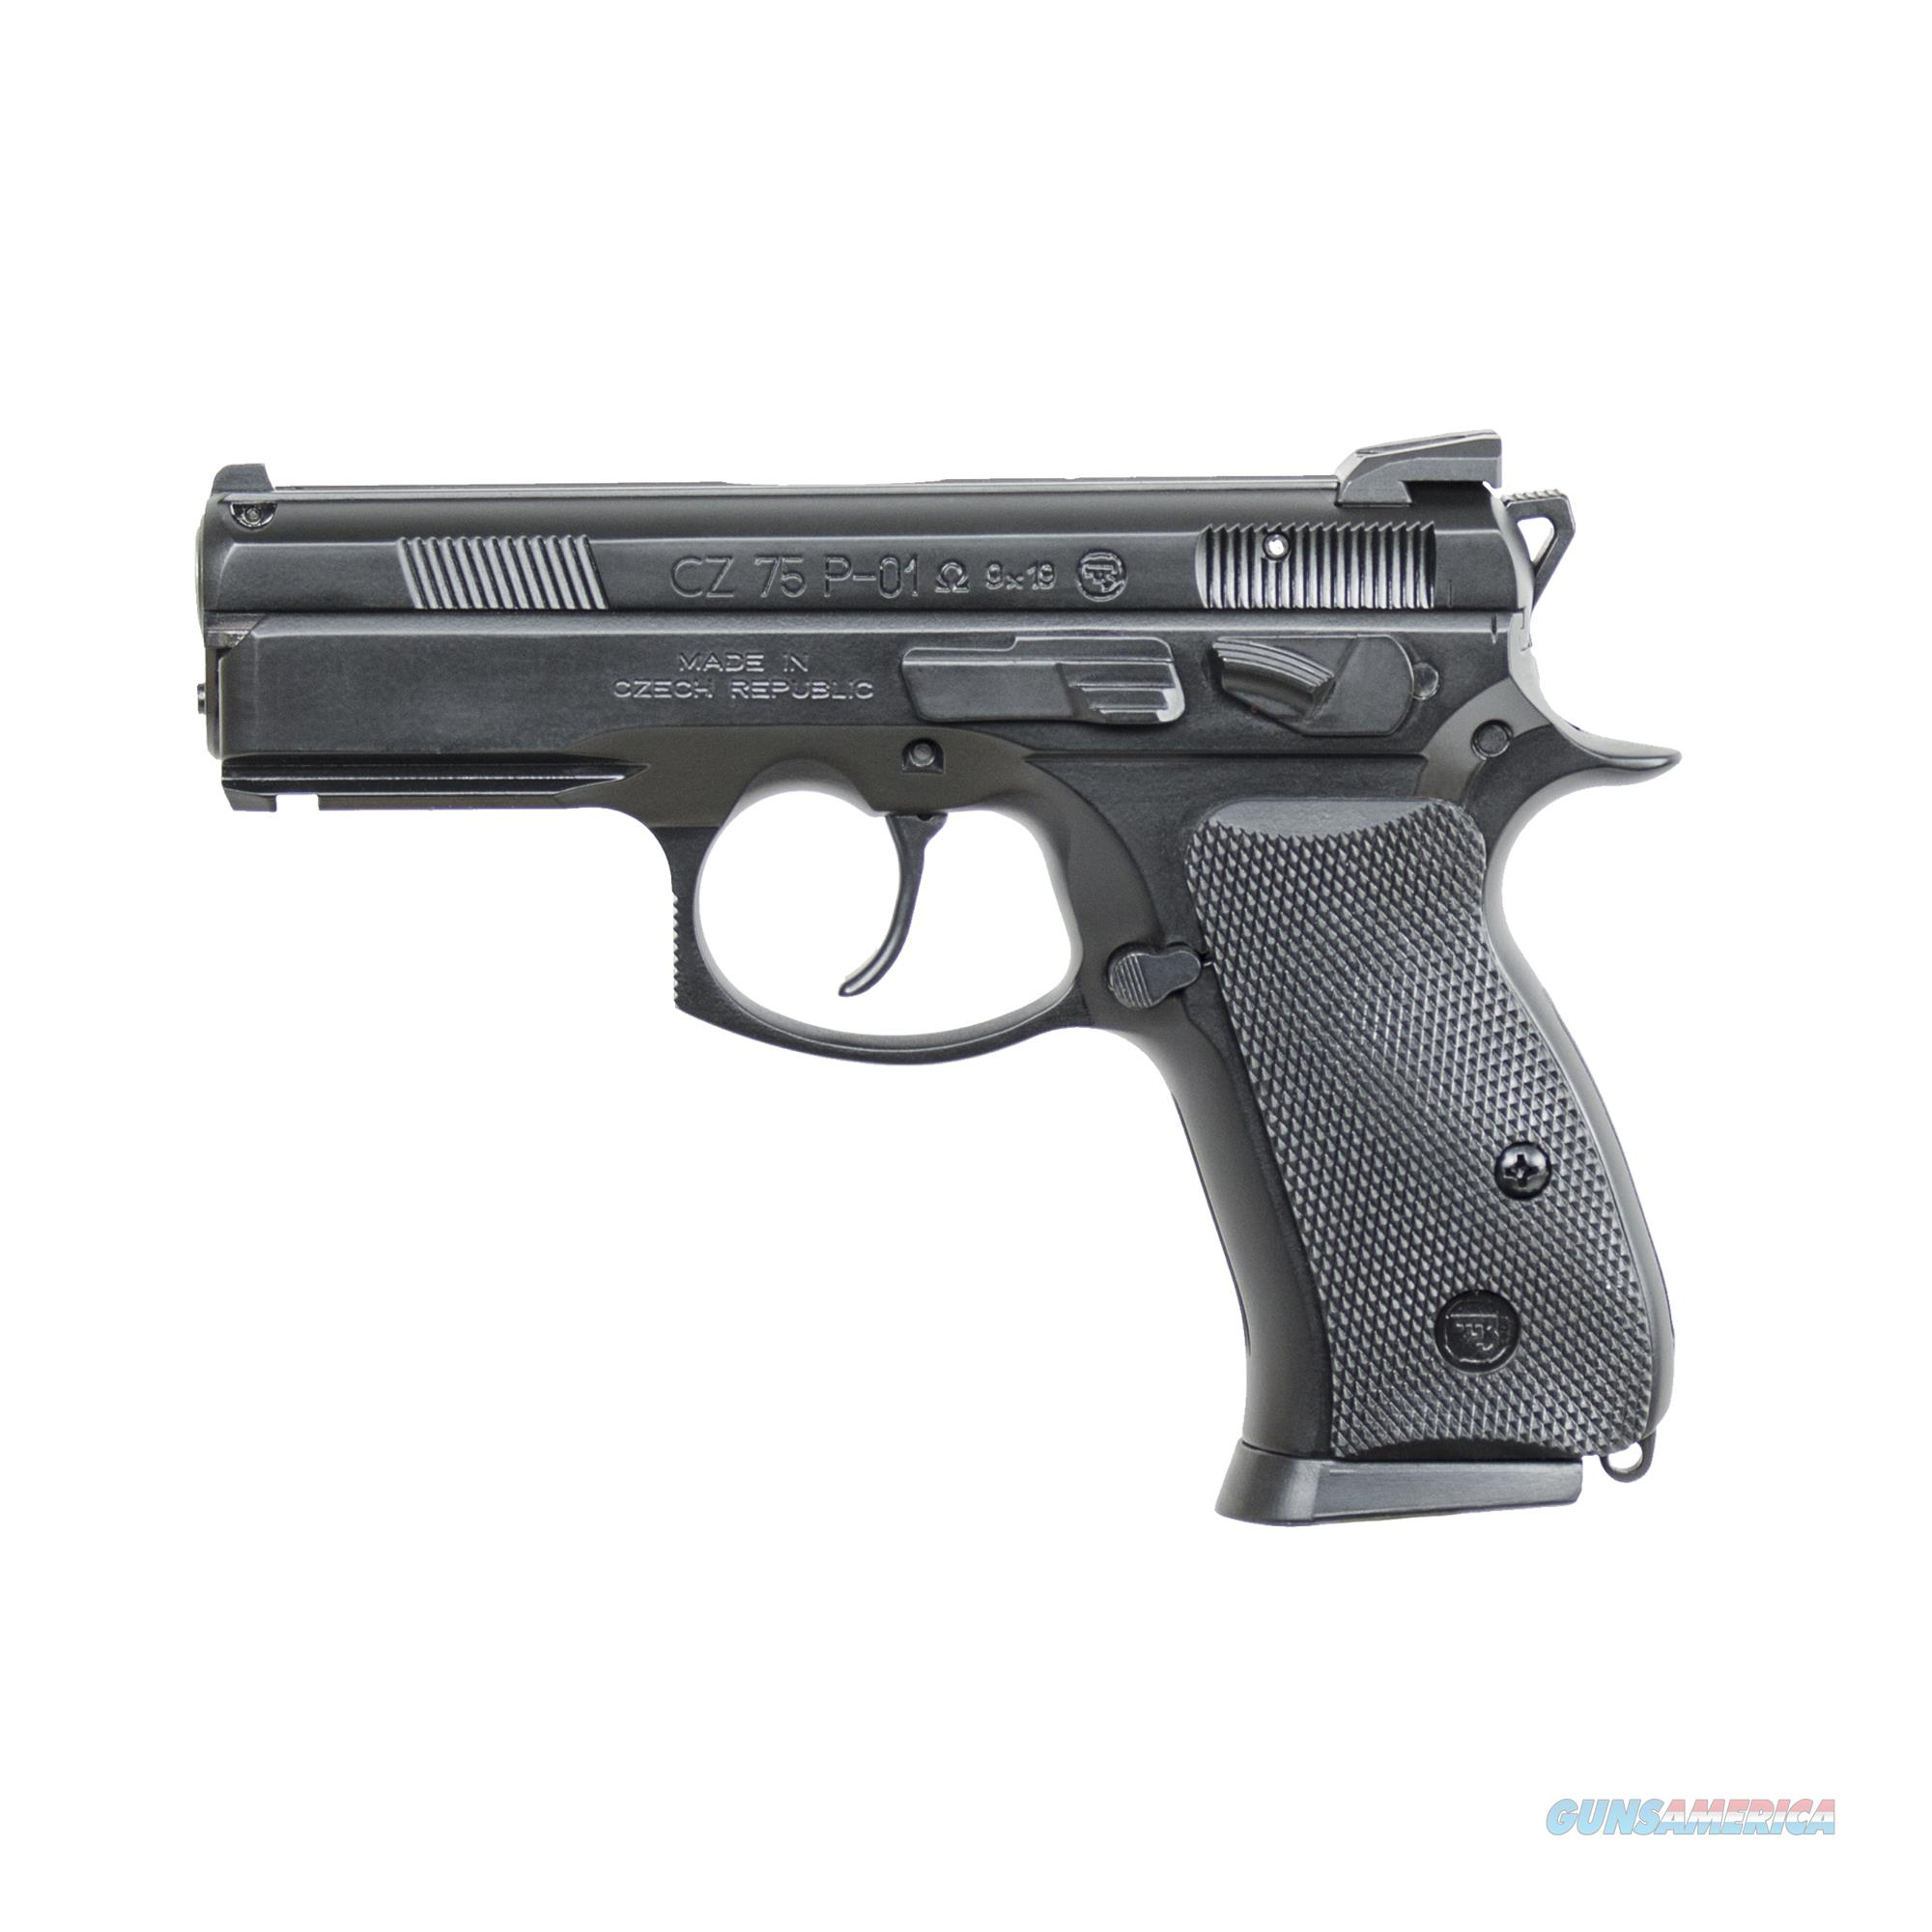 CZ P-01 Convertible (Omega)  Guns > Pistols > CZ Pistols